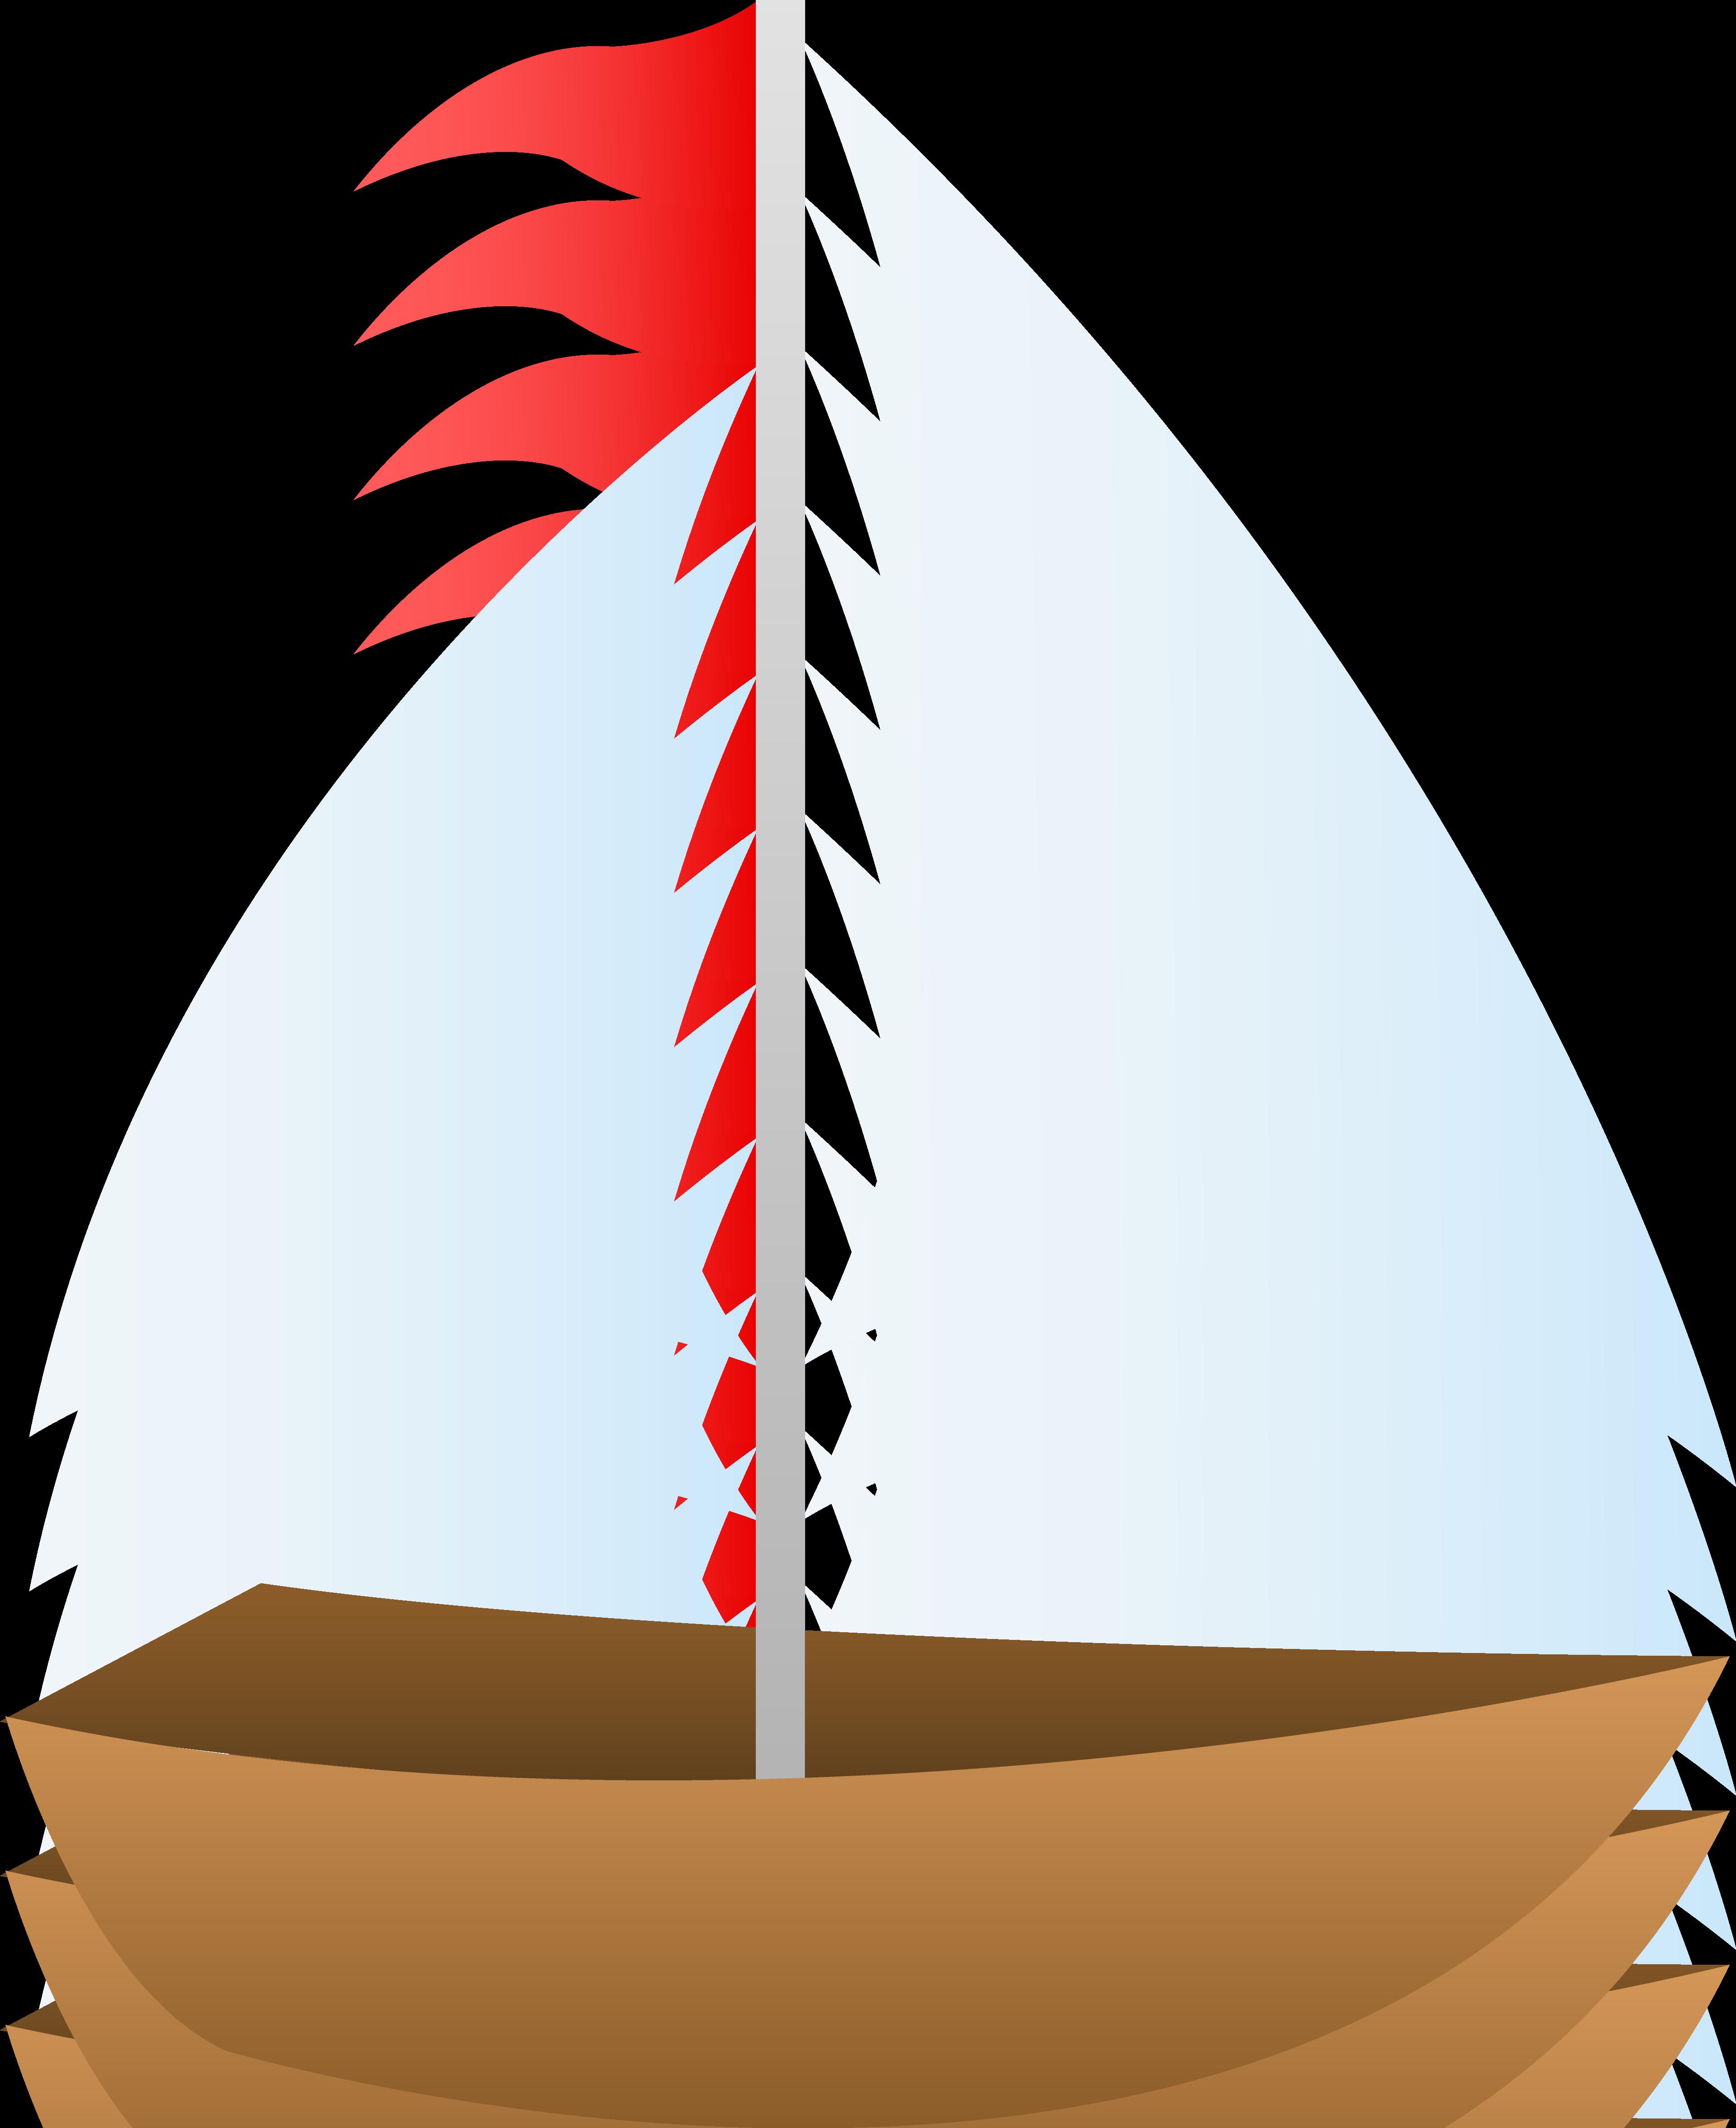 Sail Boat Boat Drawing Sailboat Drawing Sailboat